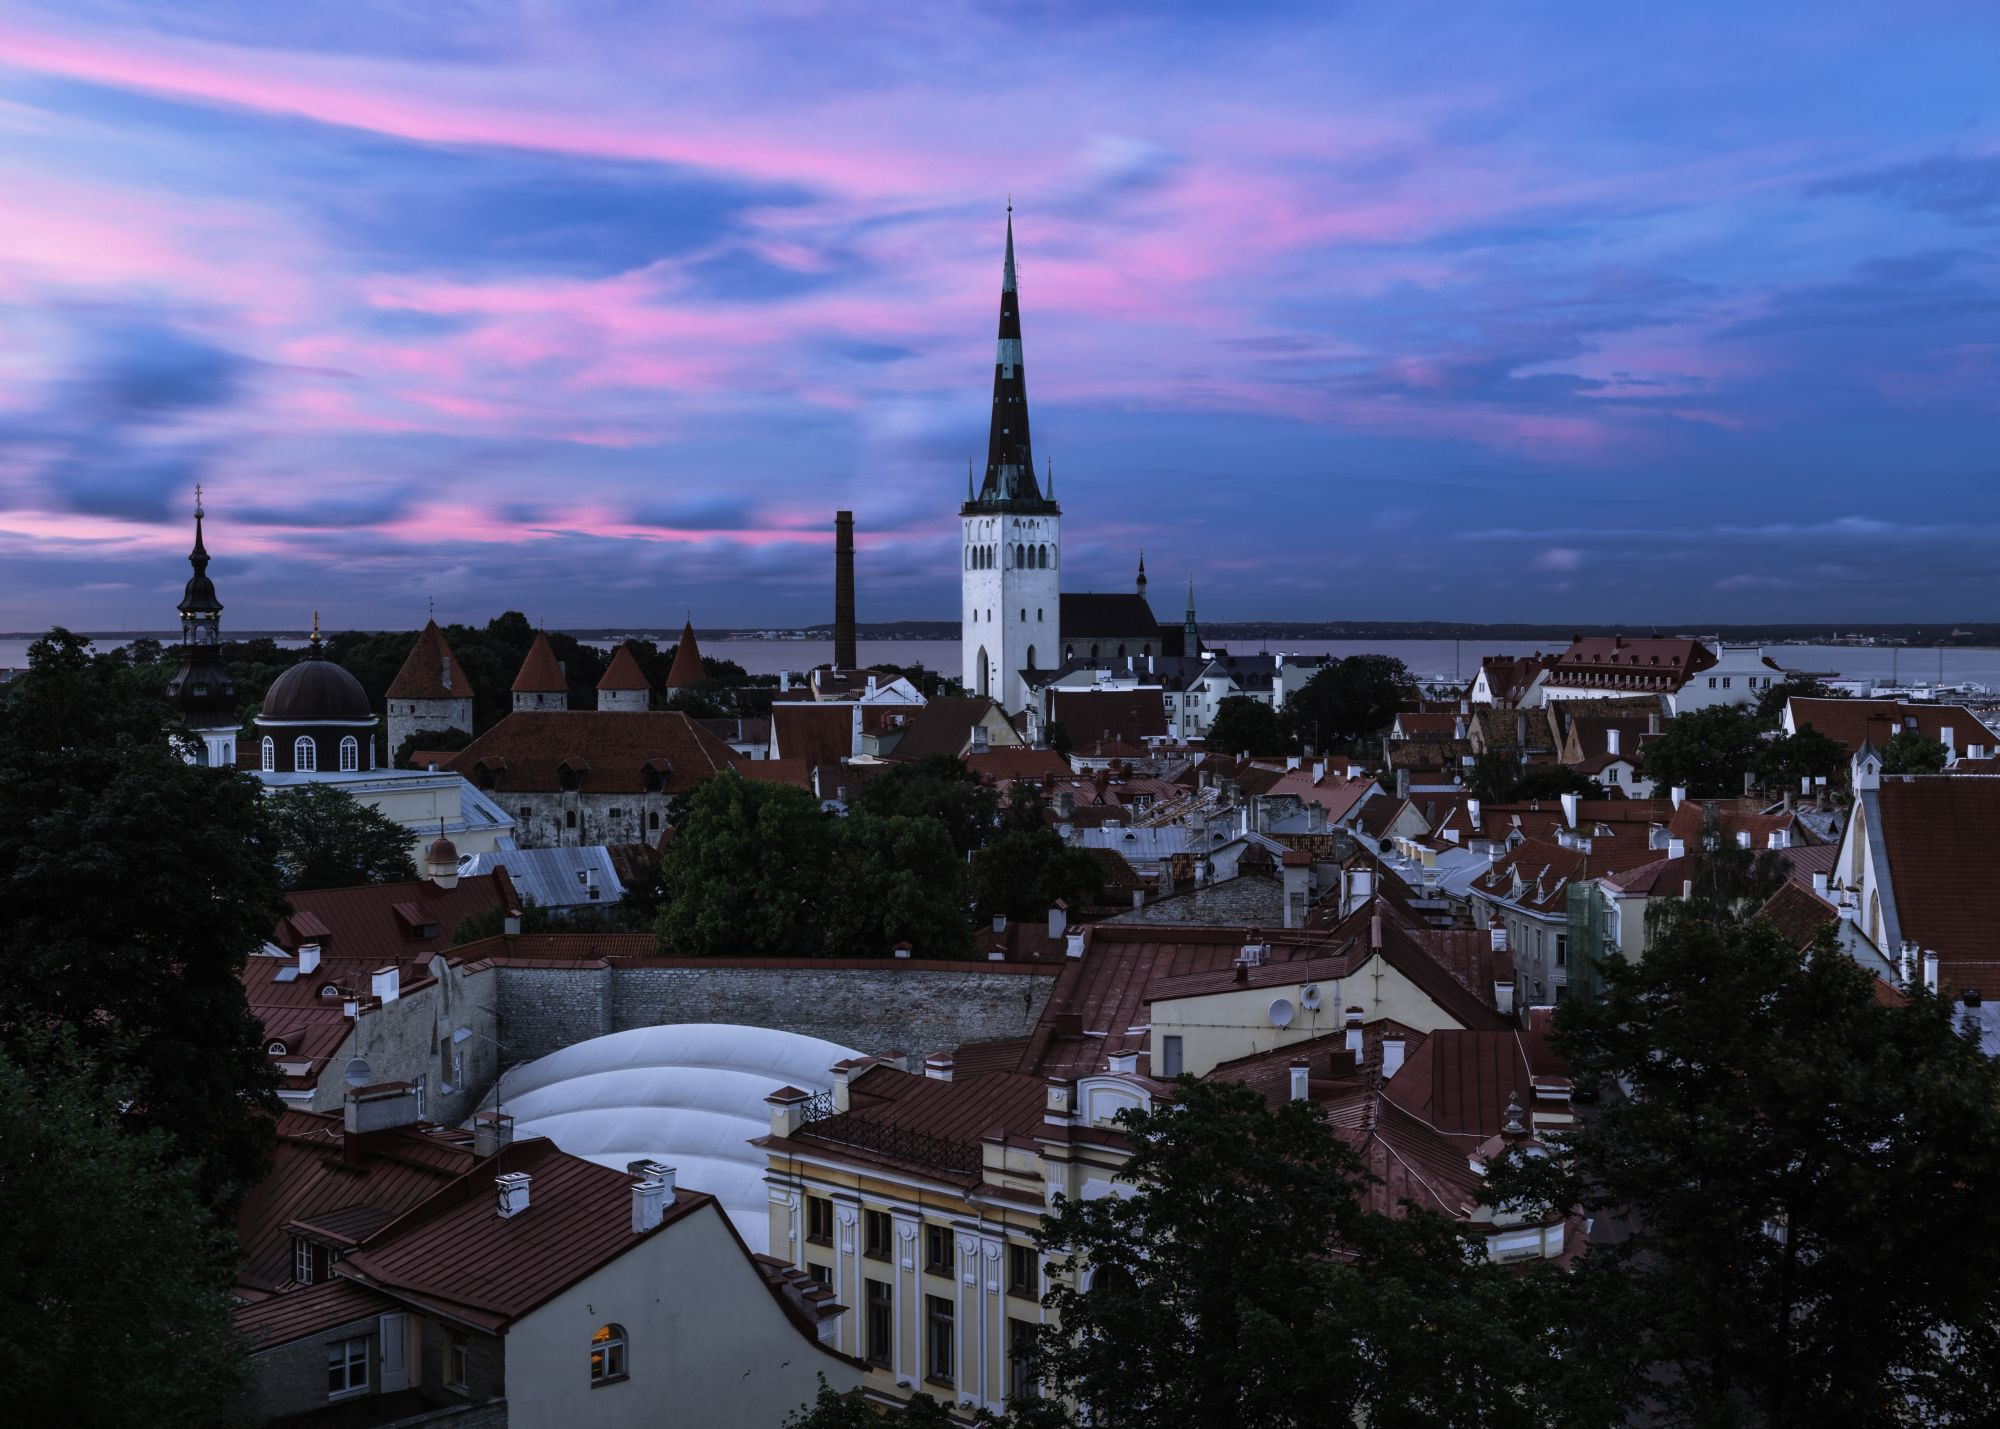 Russia & Baltics Signature Tours 2019 - 2020 -  tallinn sunset over city